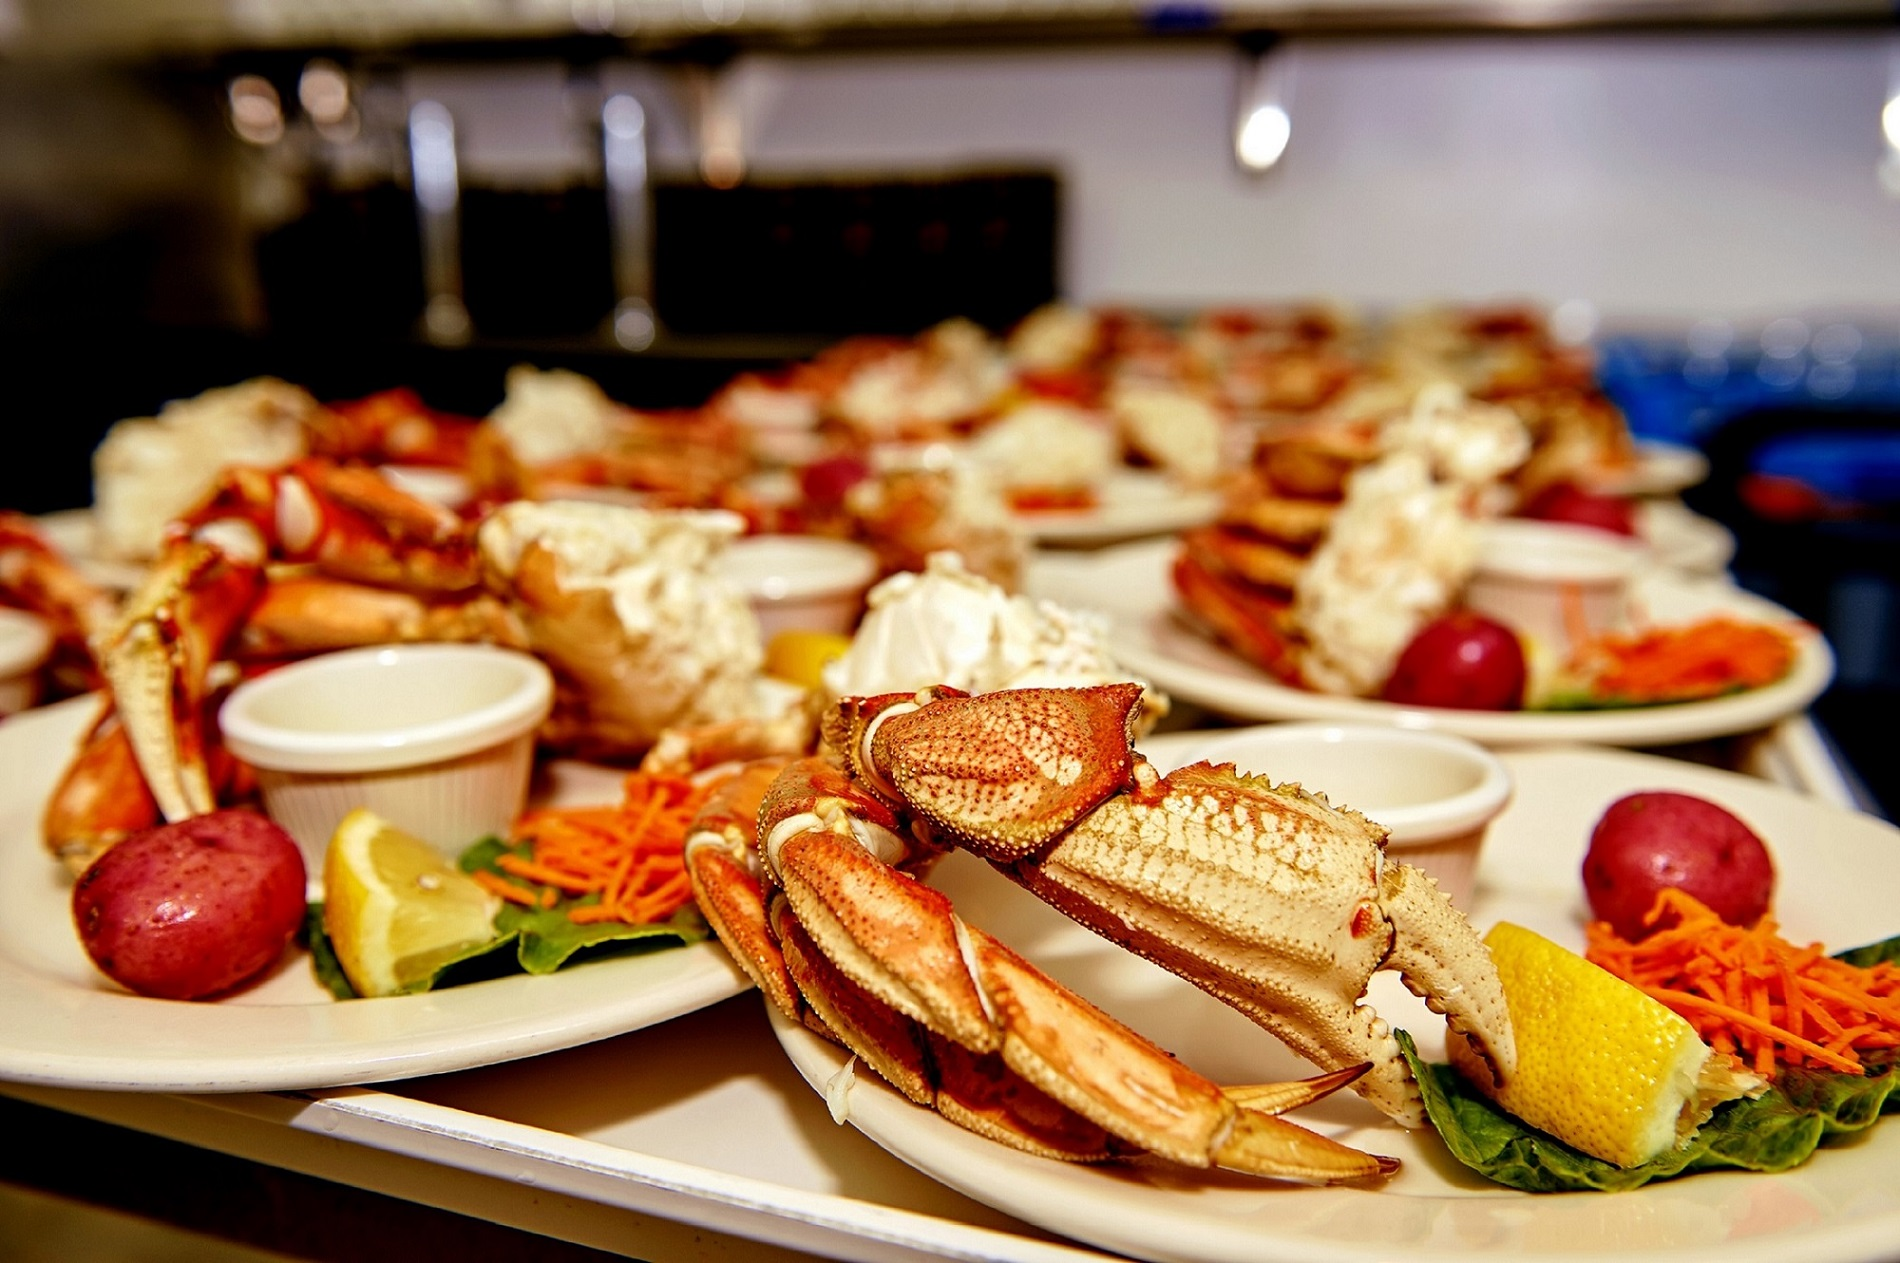 https://taquanair.com/wp-content/uploads/2020/02/Rainforest-Sanctuary-Crab-Feast-Tray-of-Crab.jpg